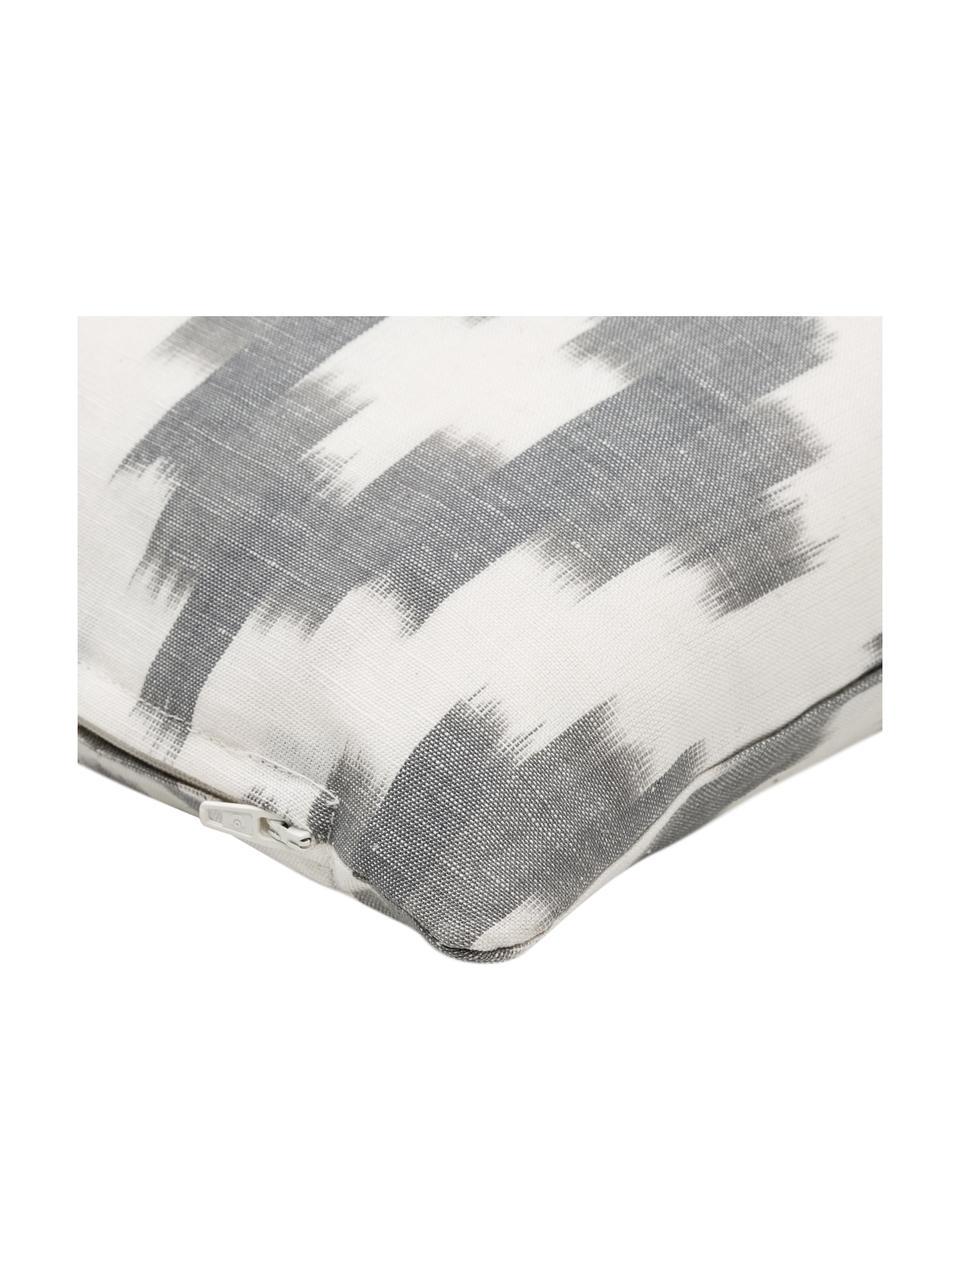 Kissenhülle Boho Bash mit Ikat-Muster, Grau, 40 x 40 cm